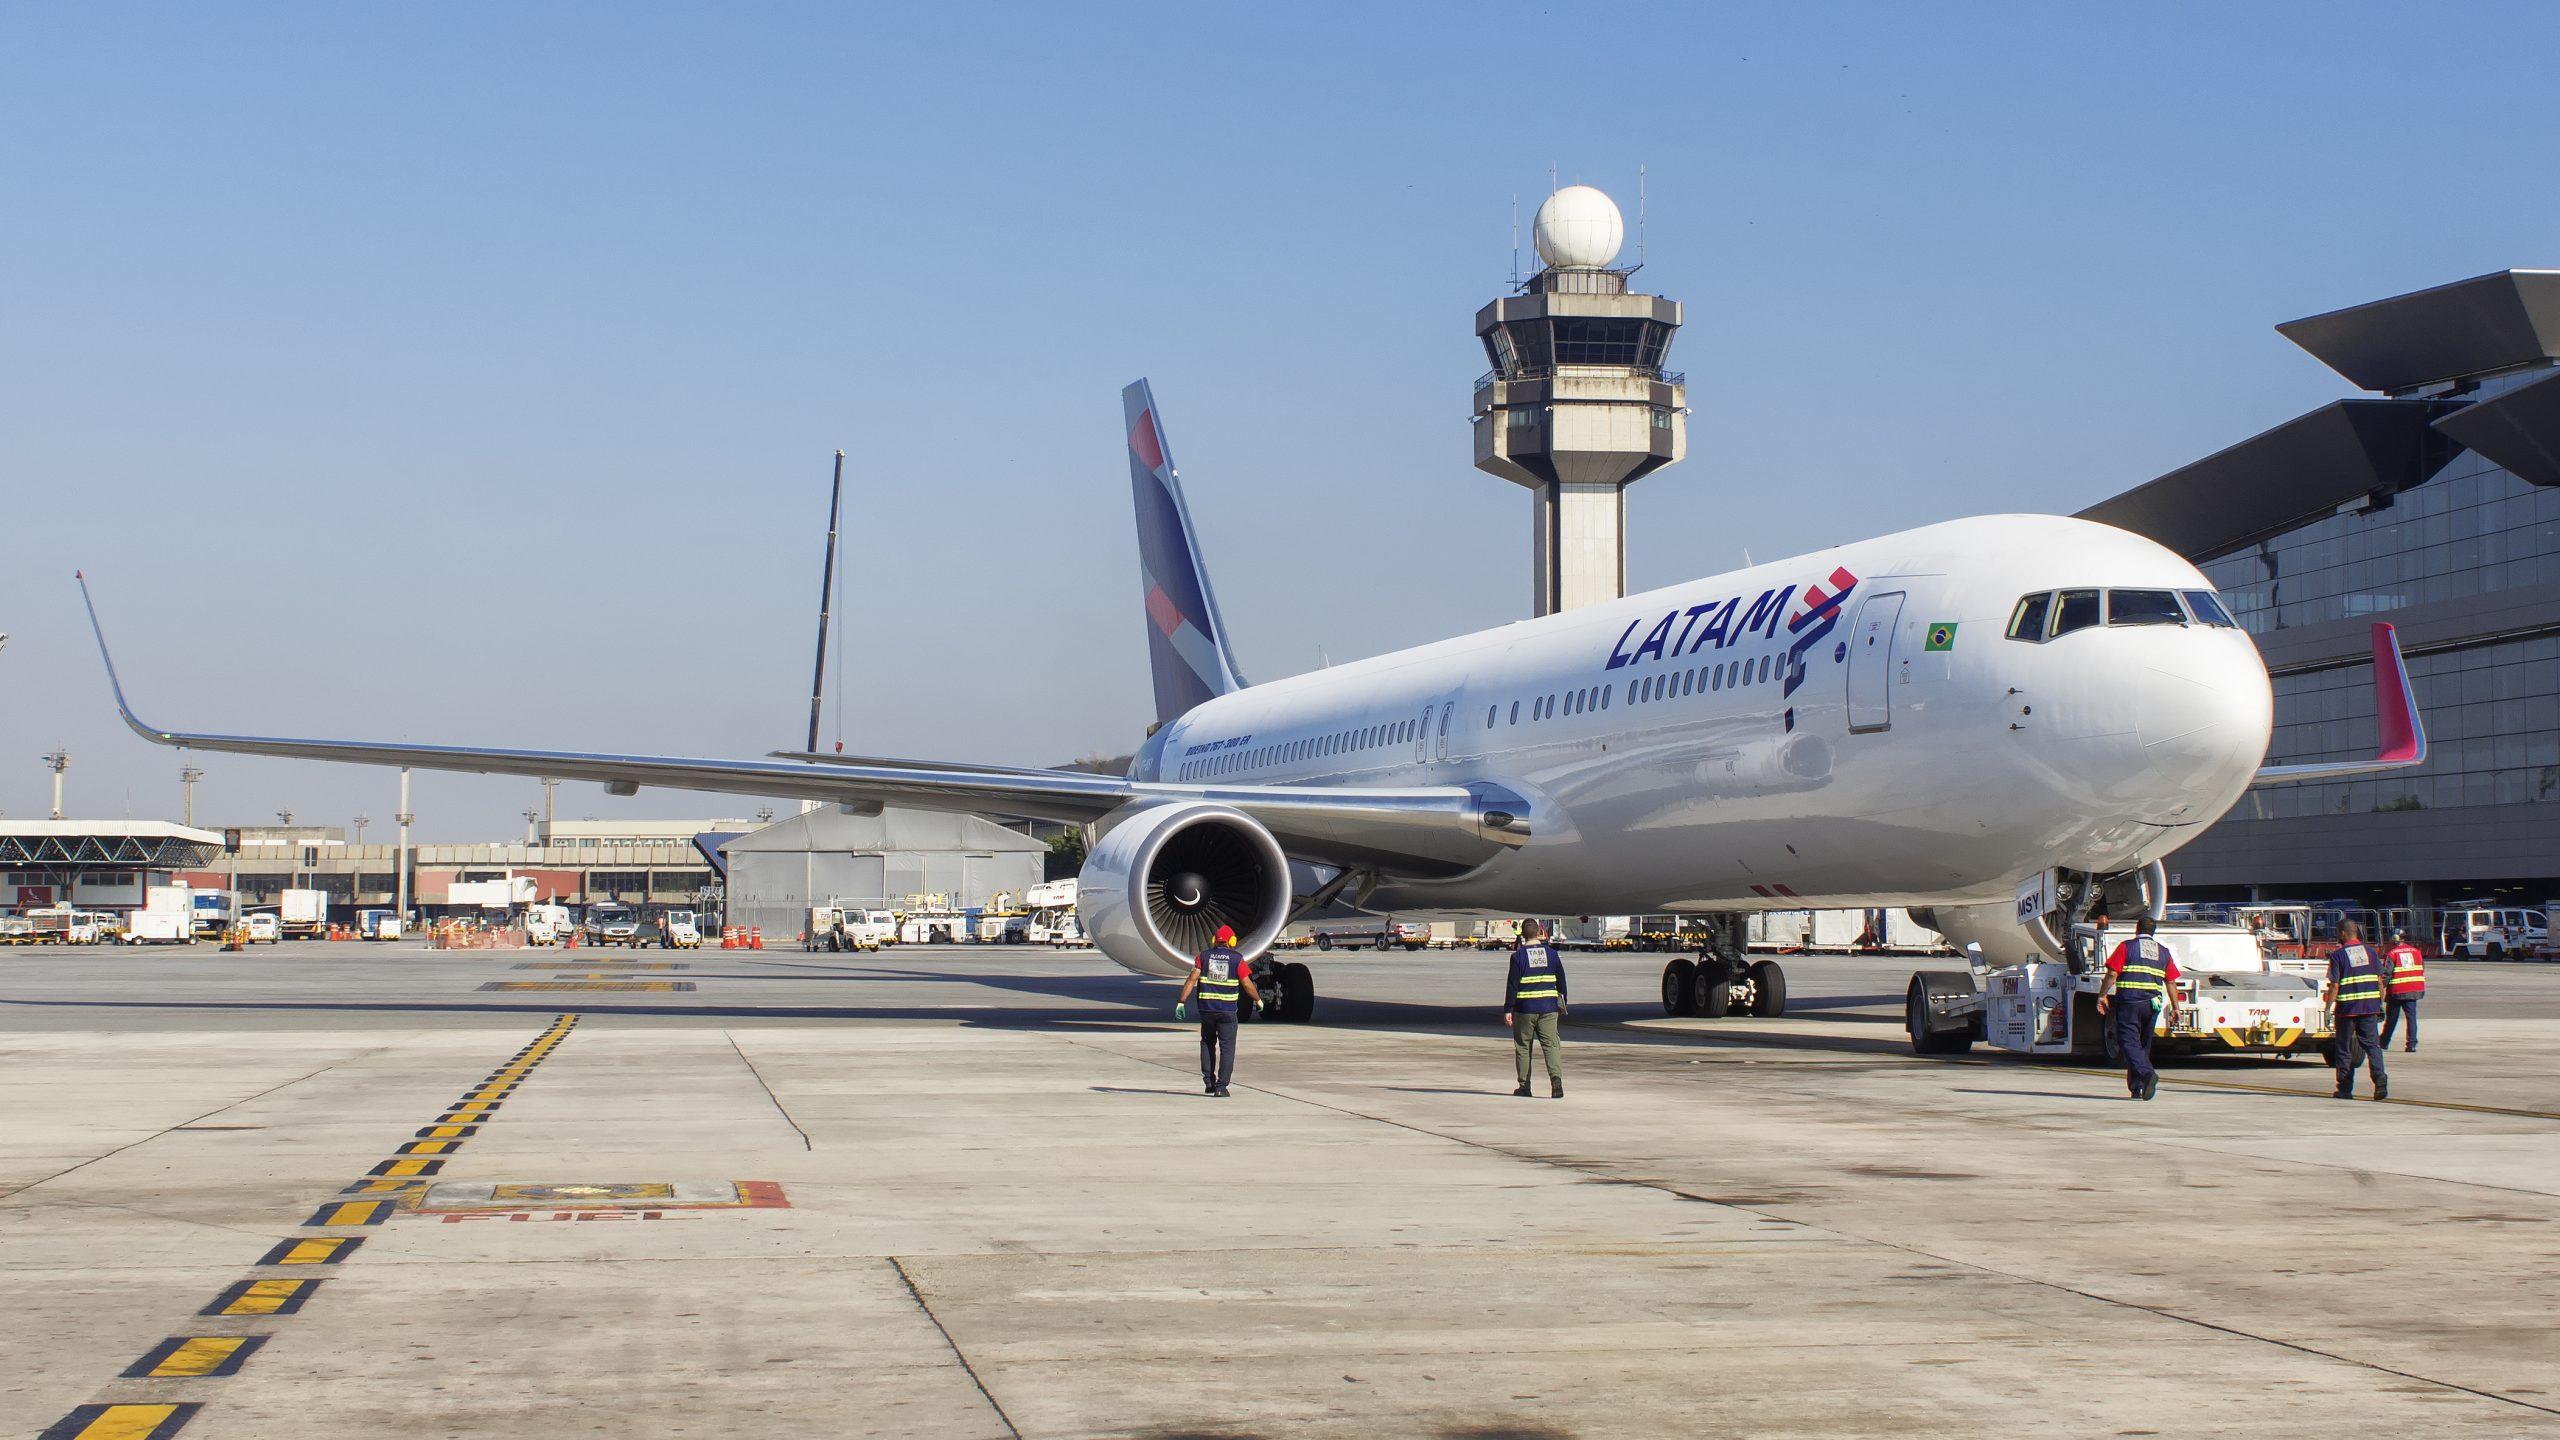 Pandemia obliga a aerolíneas en Latam a pensar alianzas con rivales